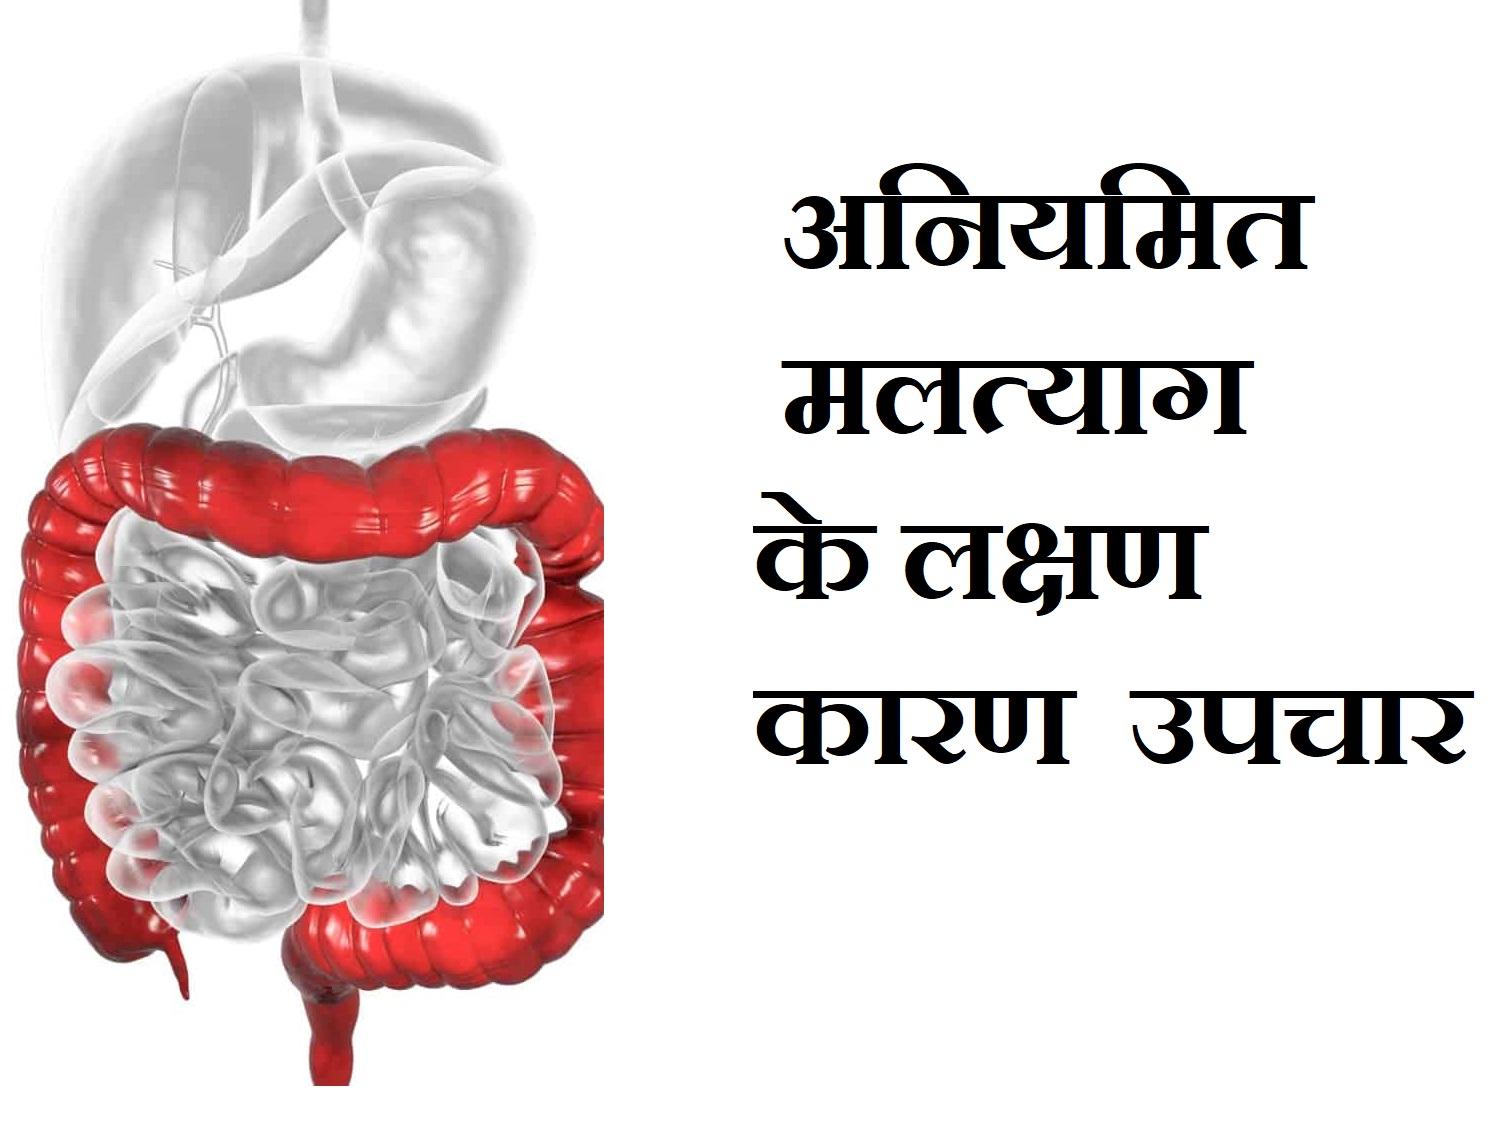 अनियमित मलत्याग के लक्षण, कारण व उपचार ,IBS Irritable Bowel Syndrome Problem In Hindi, Nayichetana.com, ibs problem in hindi